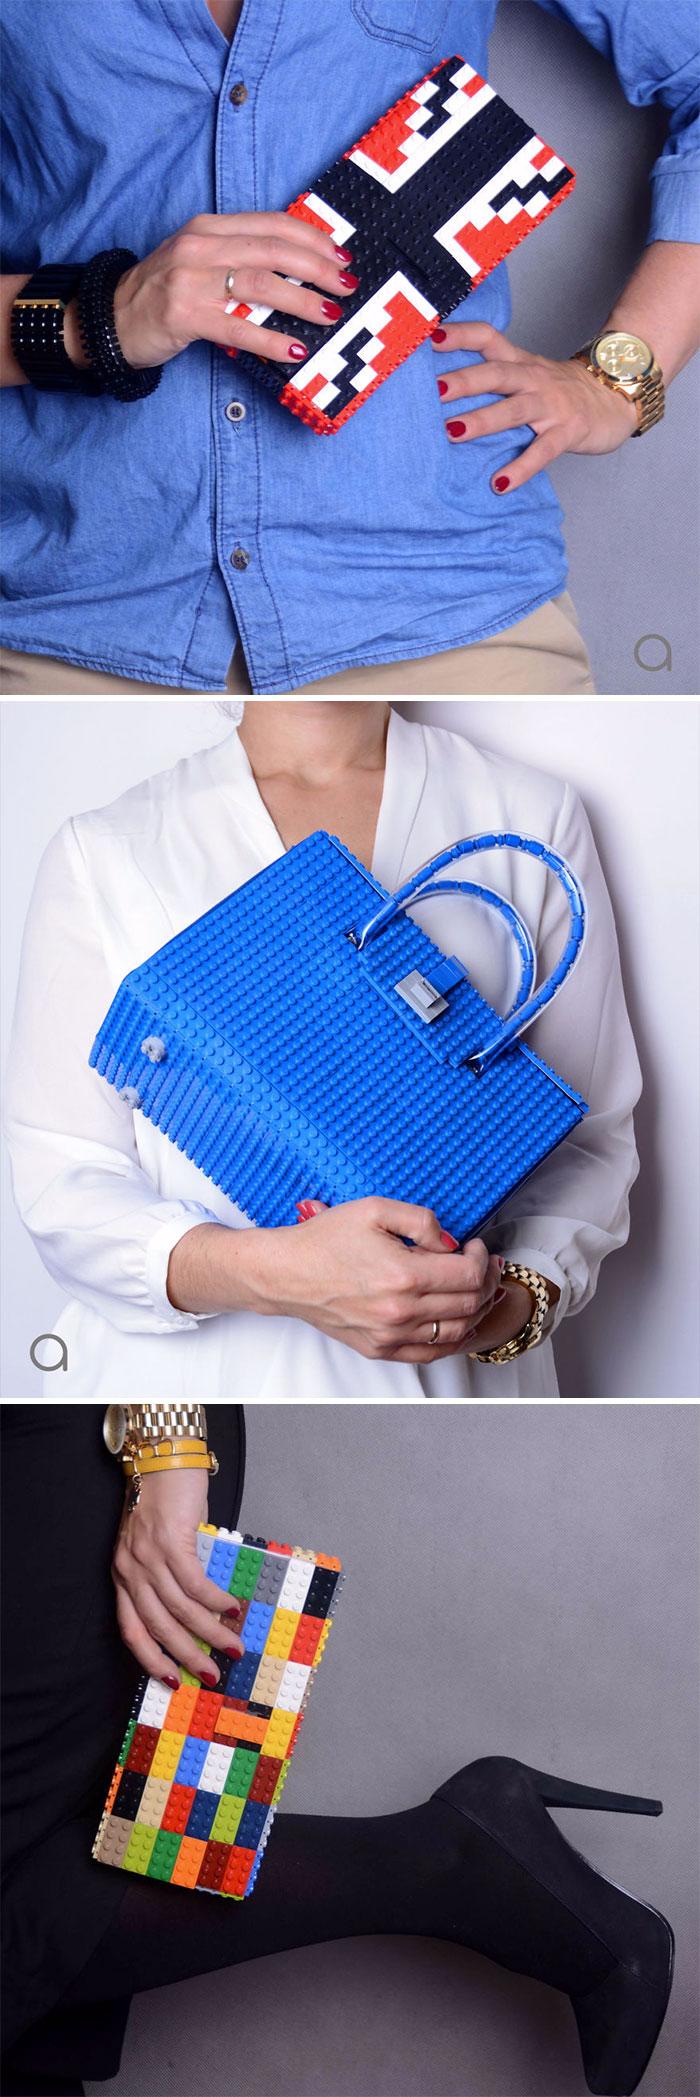 Lego Handbags